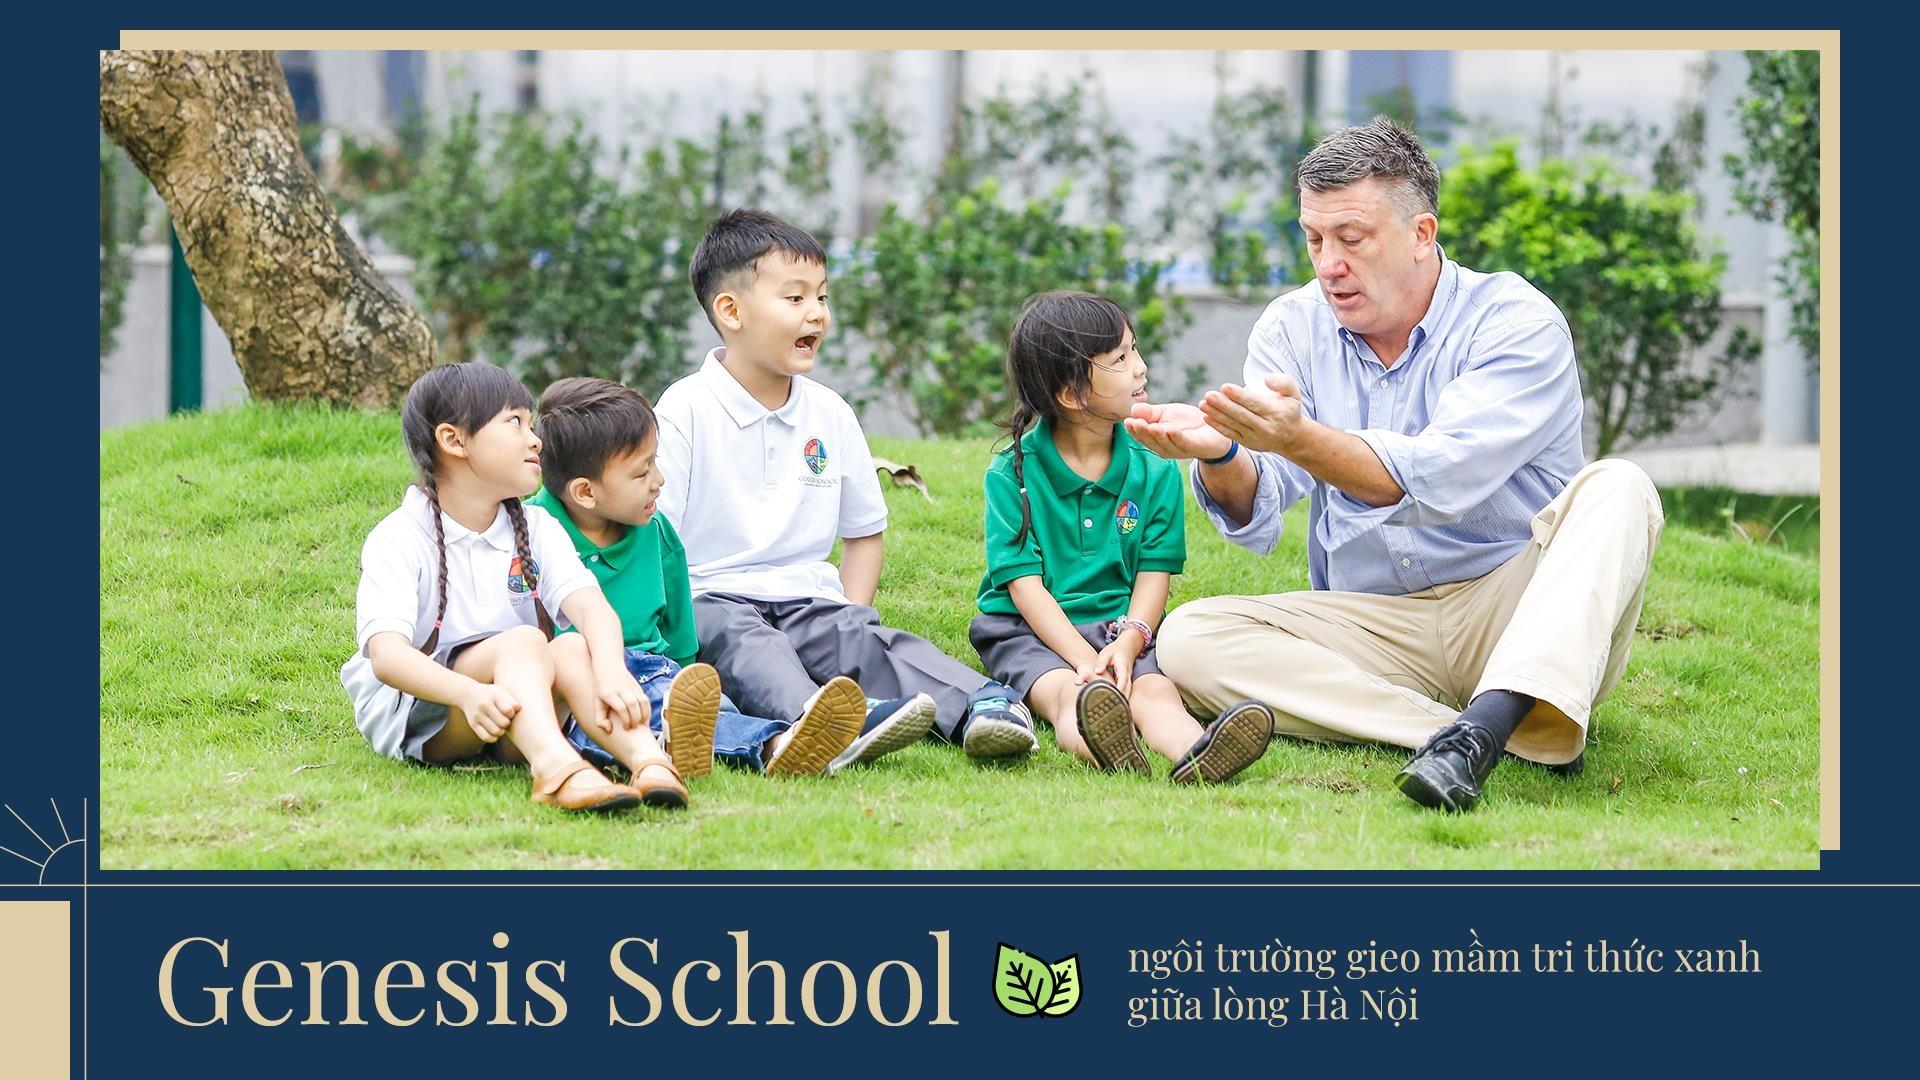 Genesis School - ngoi truong gieo mam tri thuc xanh giua long Ha Noi hinh anh 2